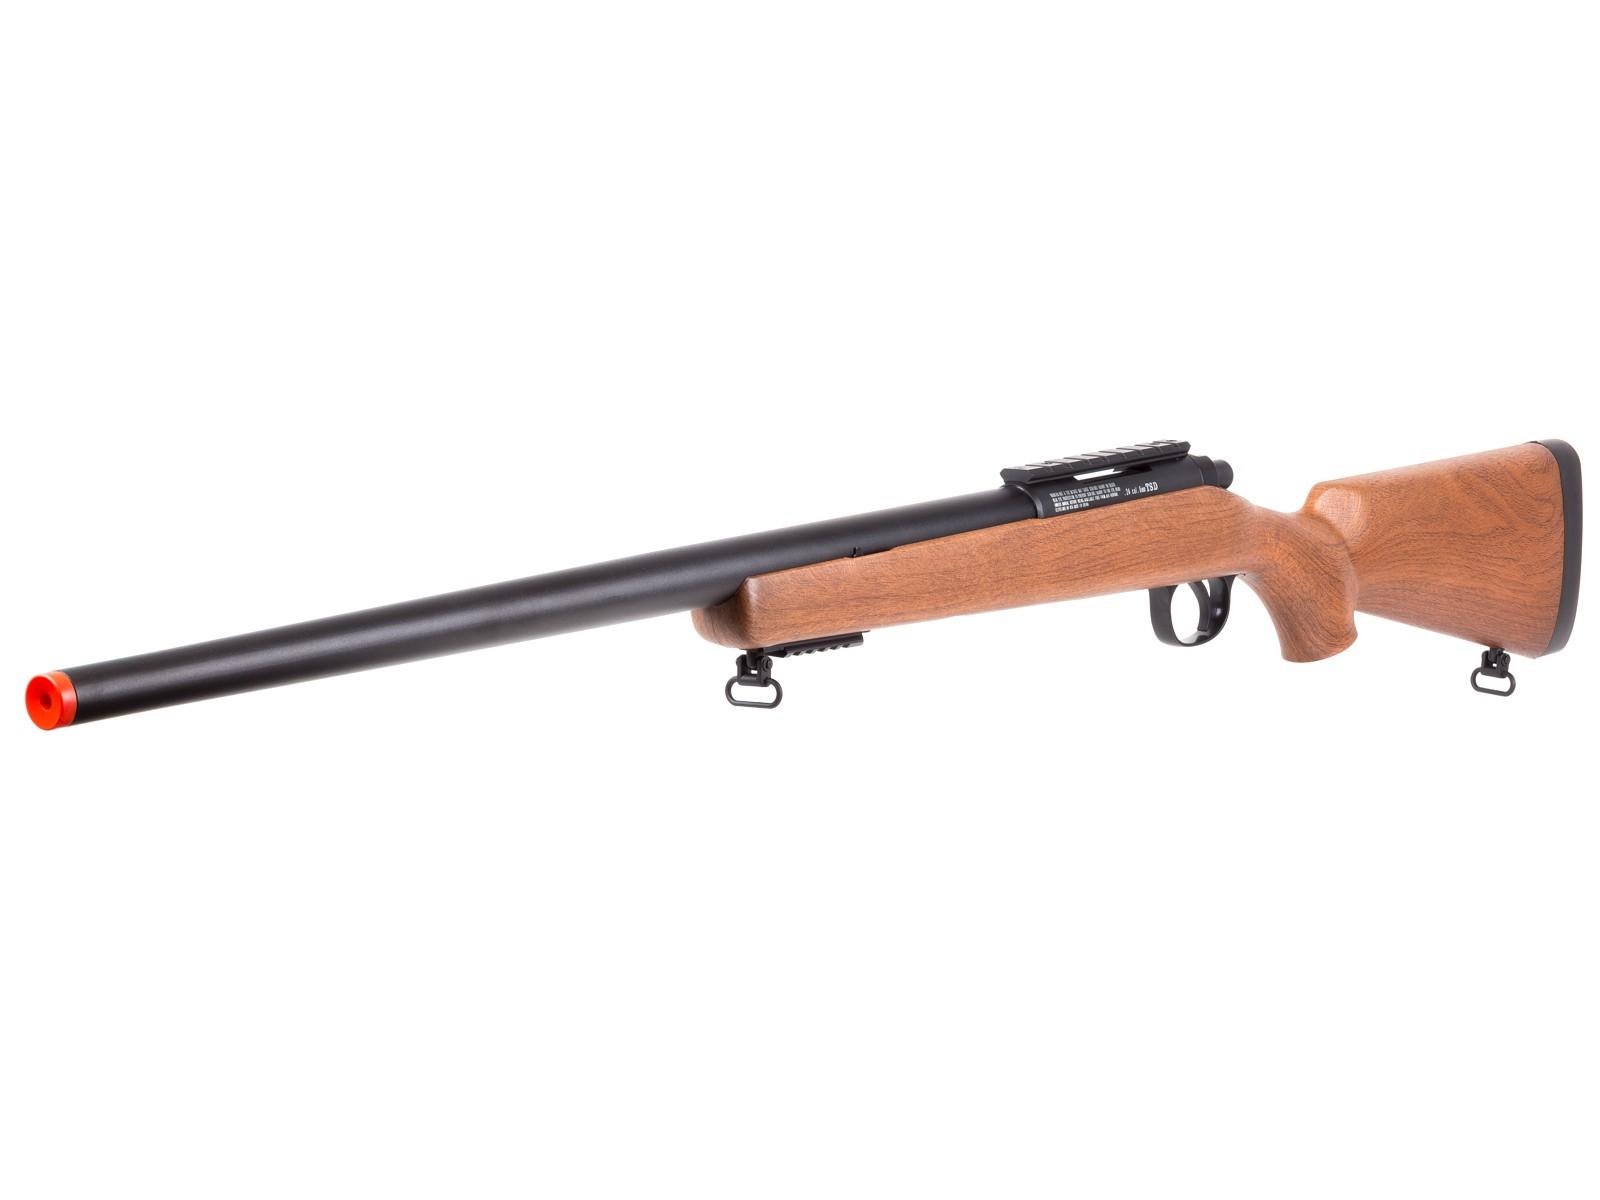 TSD_Tactical_Series_SD700__Wood_6mm